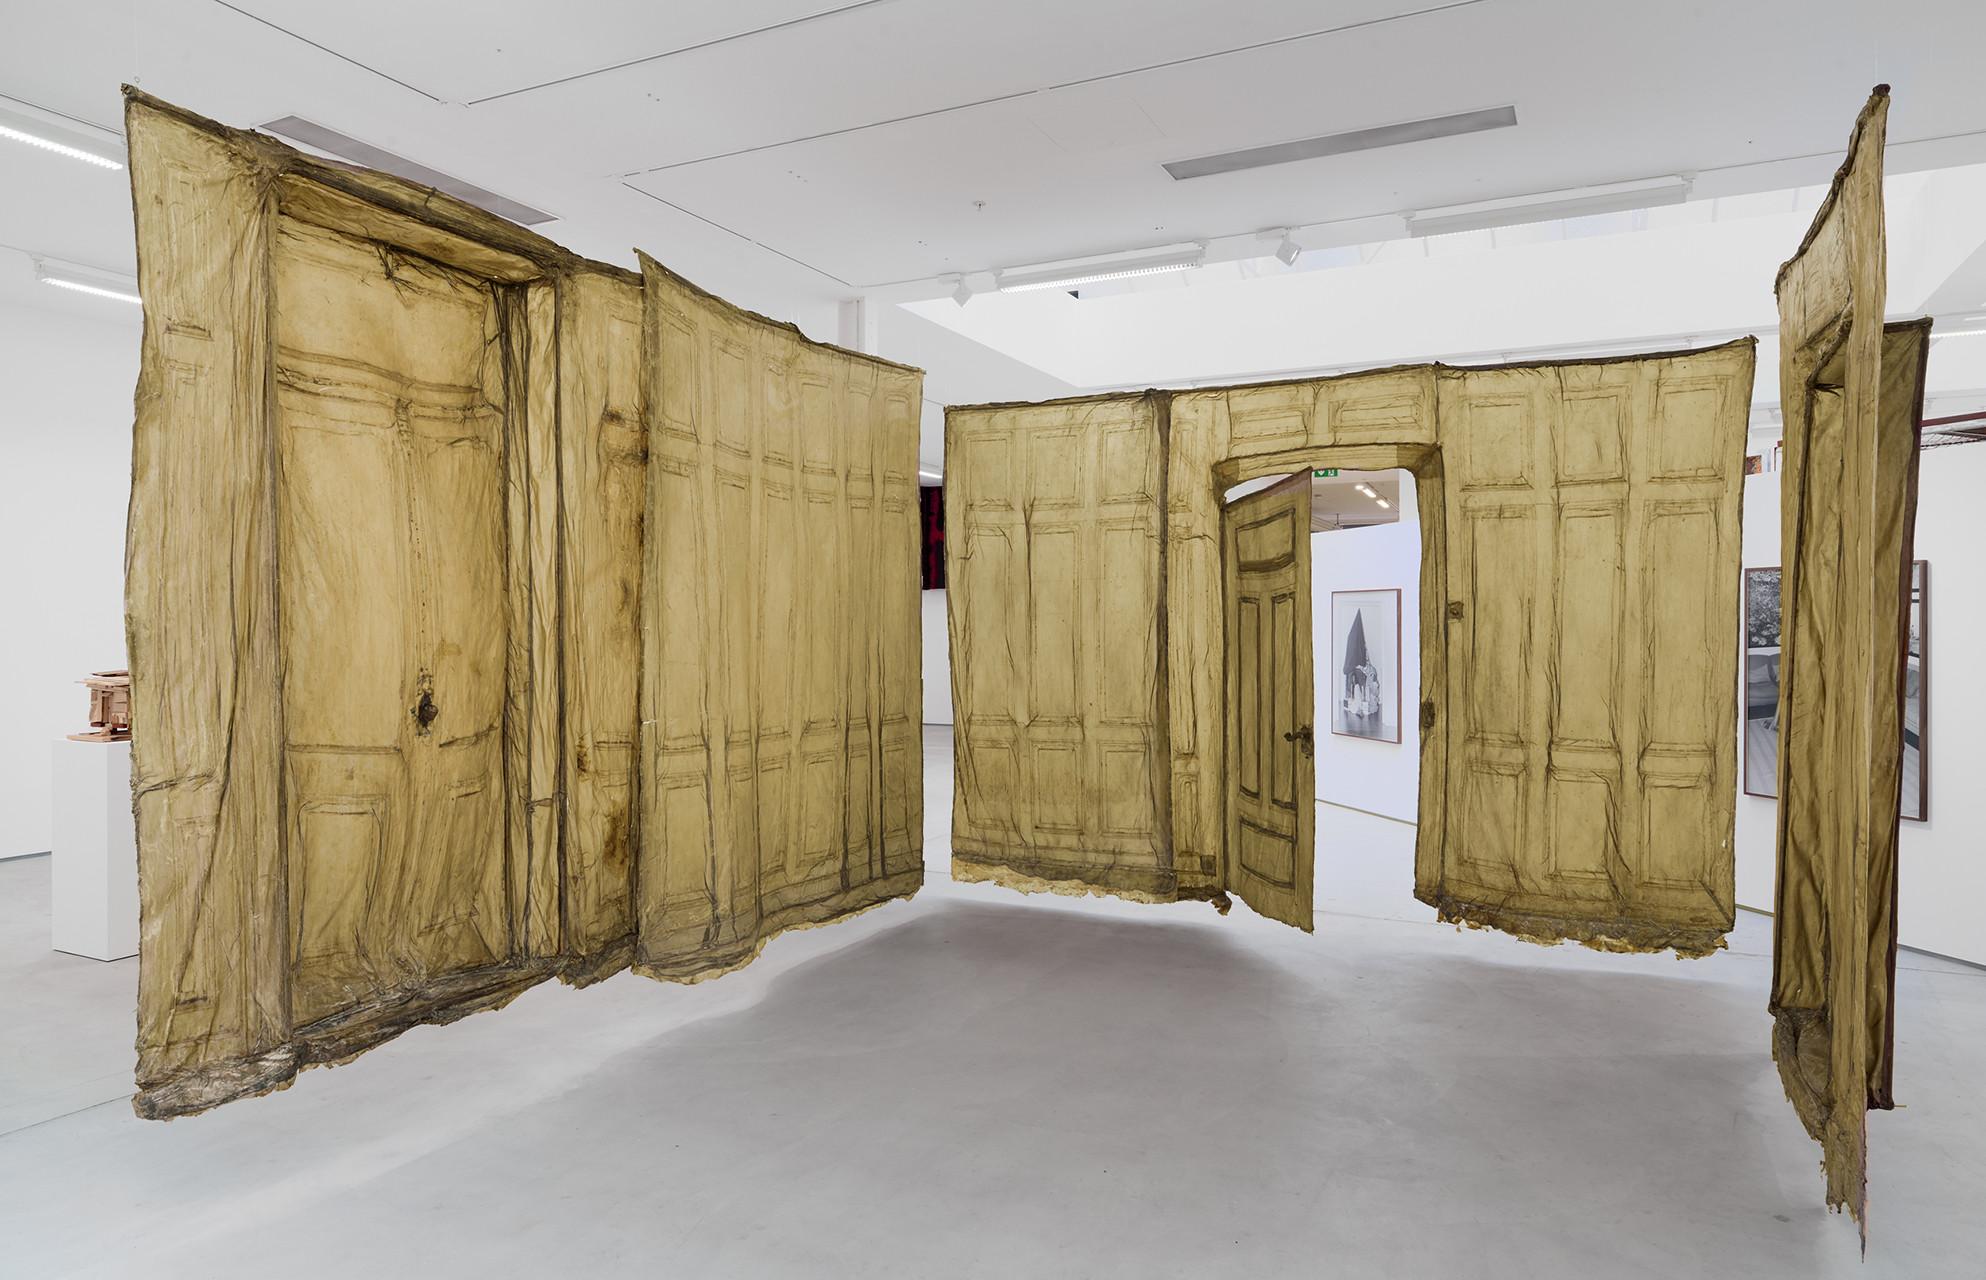 <p>Heidi Bucher, Untitled (Herrenzimmer), 1977-78</p>